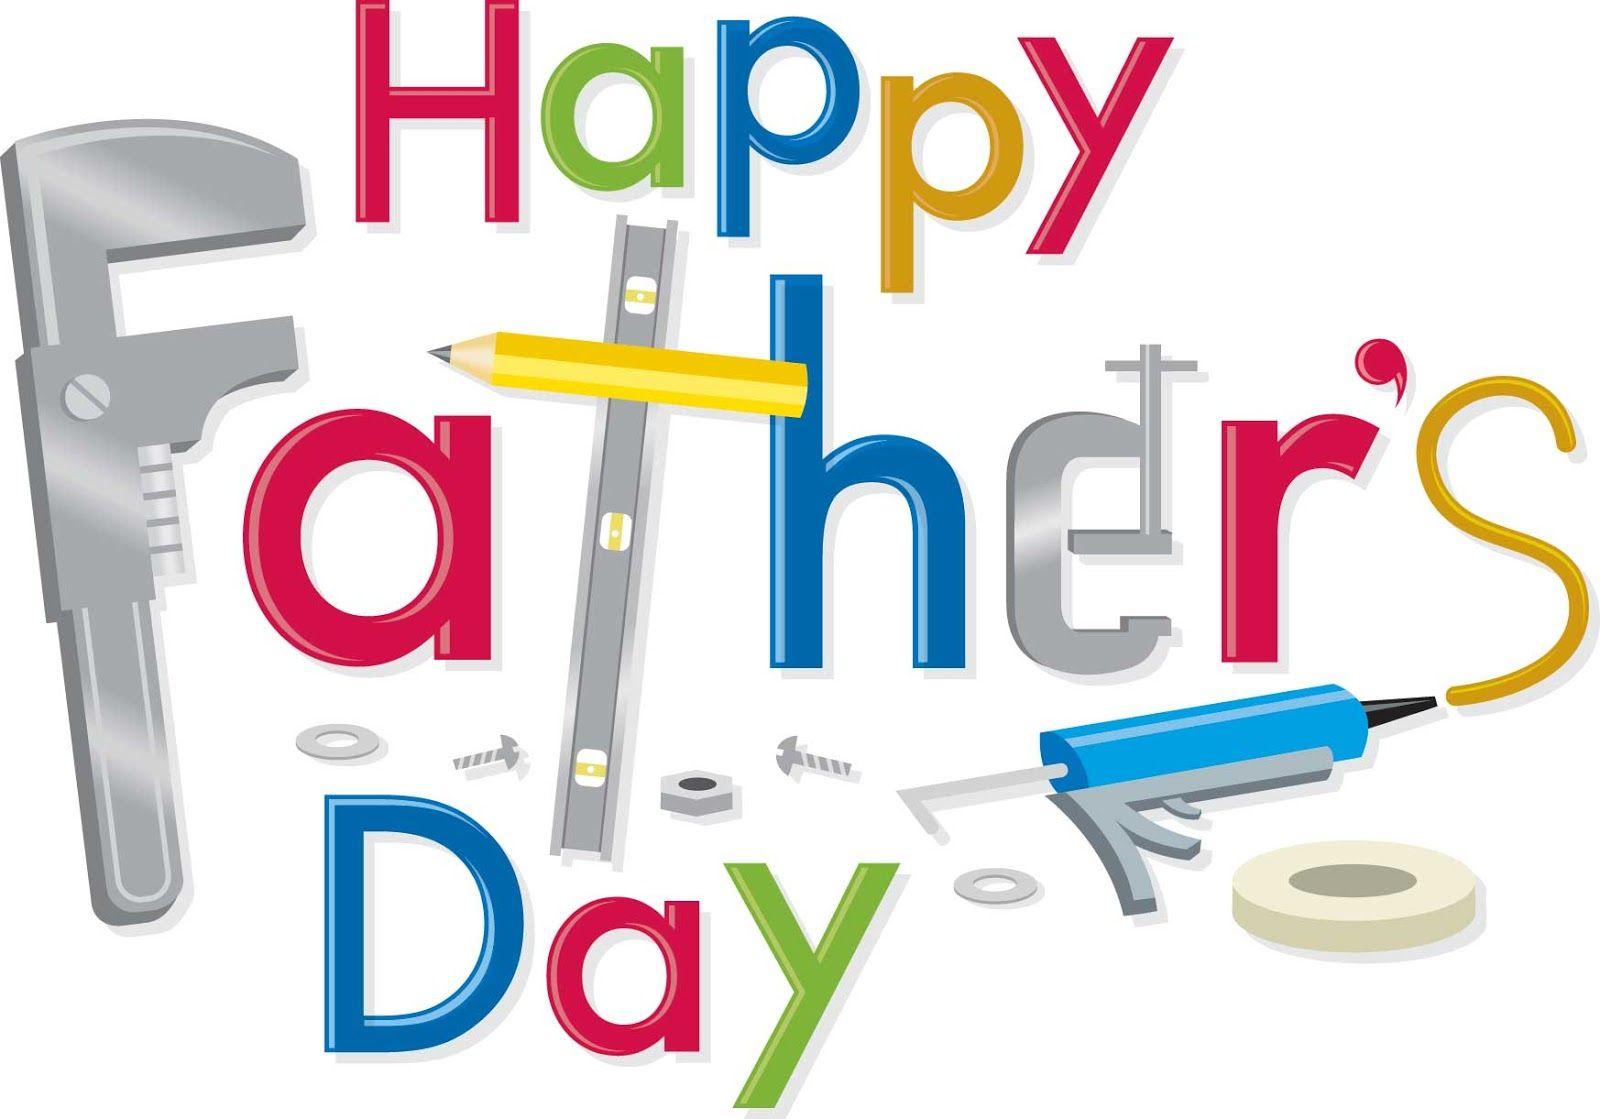 Happy Fathers Day Greetings Images Yalemzerfasfawgmail